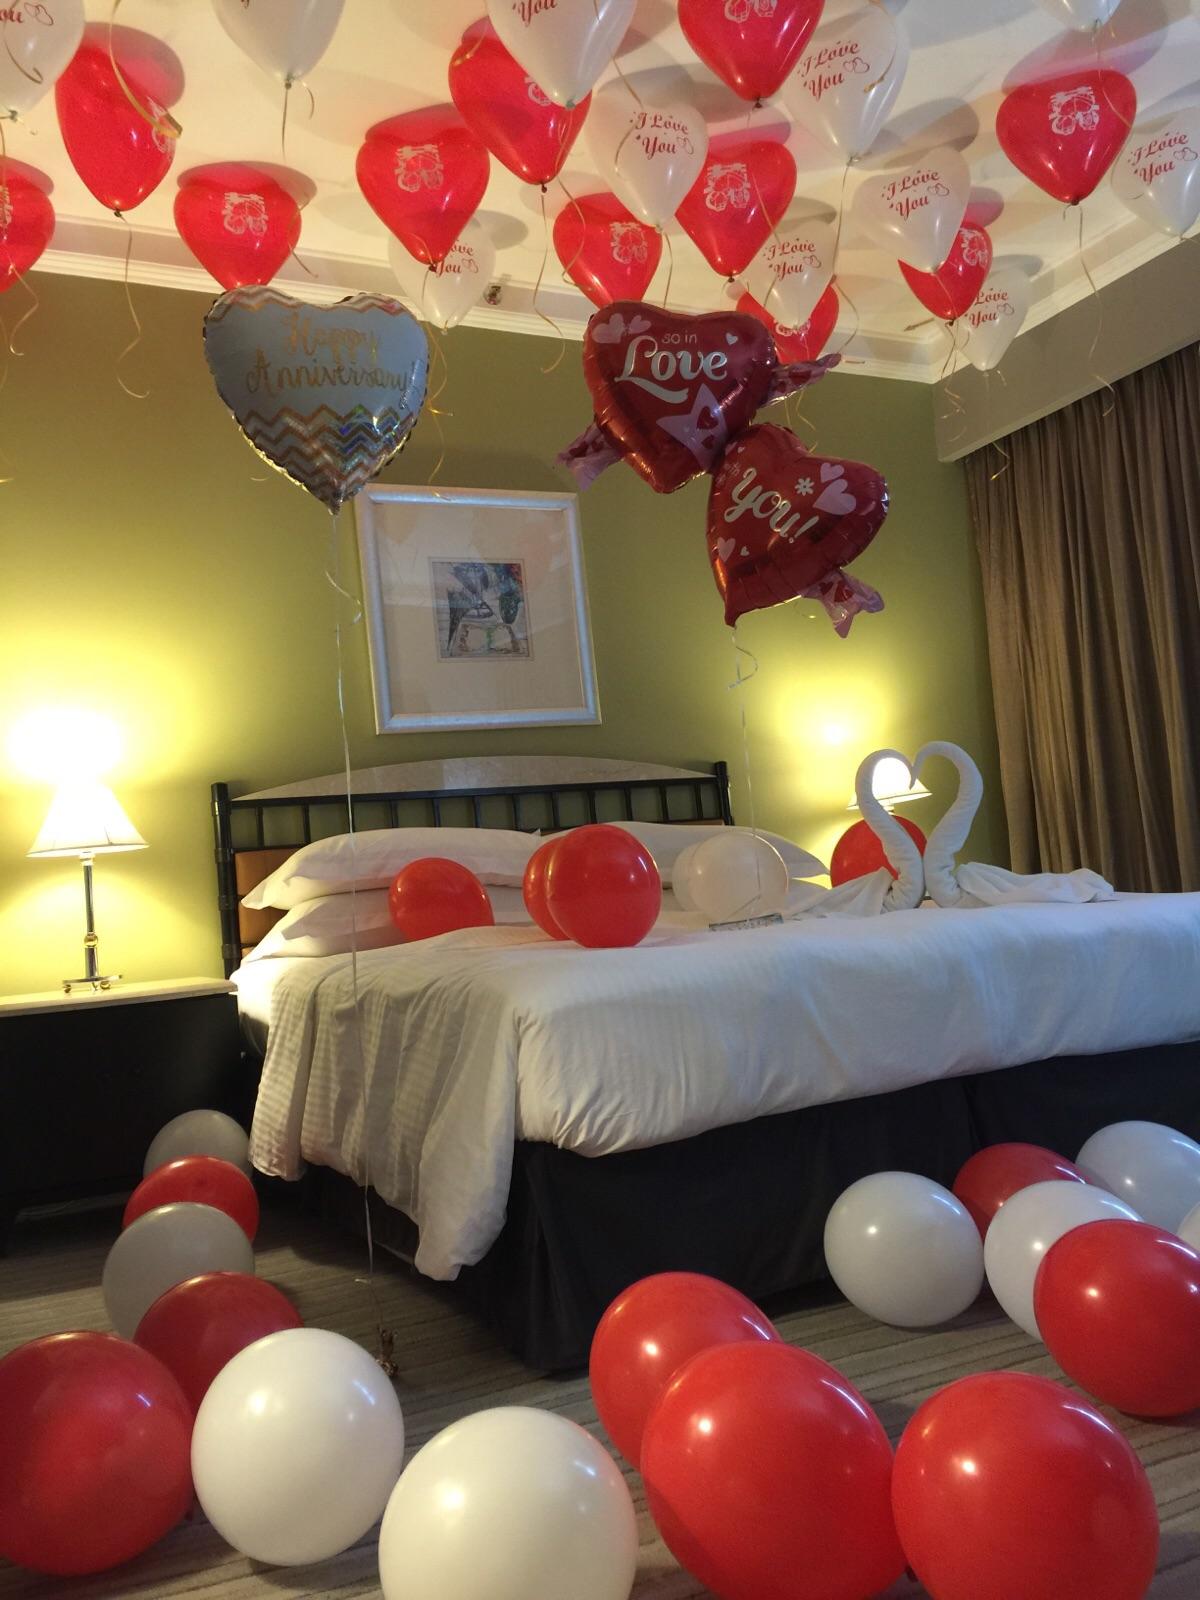 BELON JB : Balloon decoration